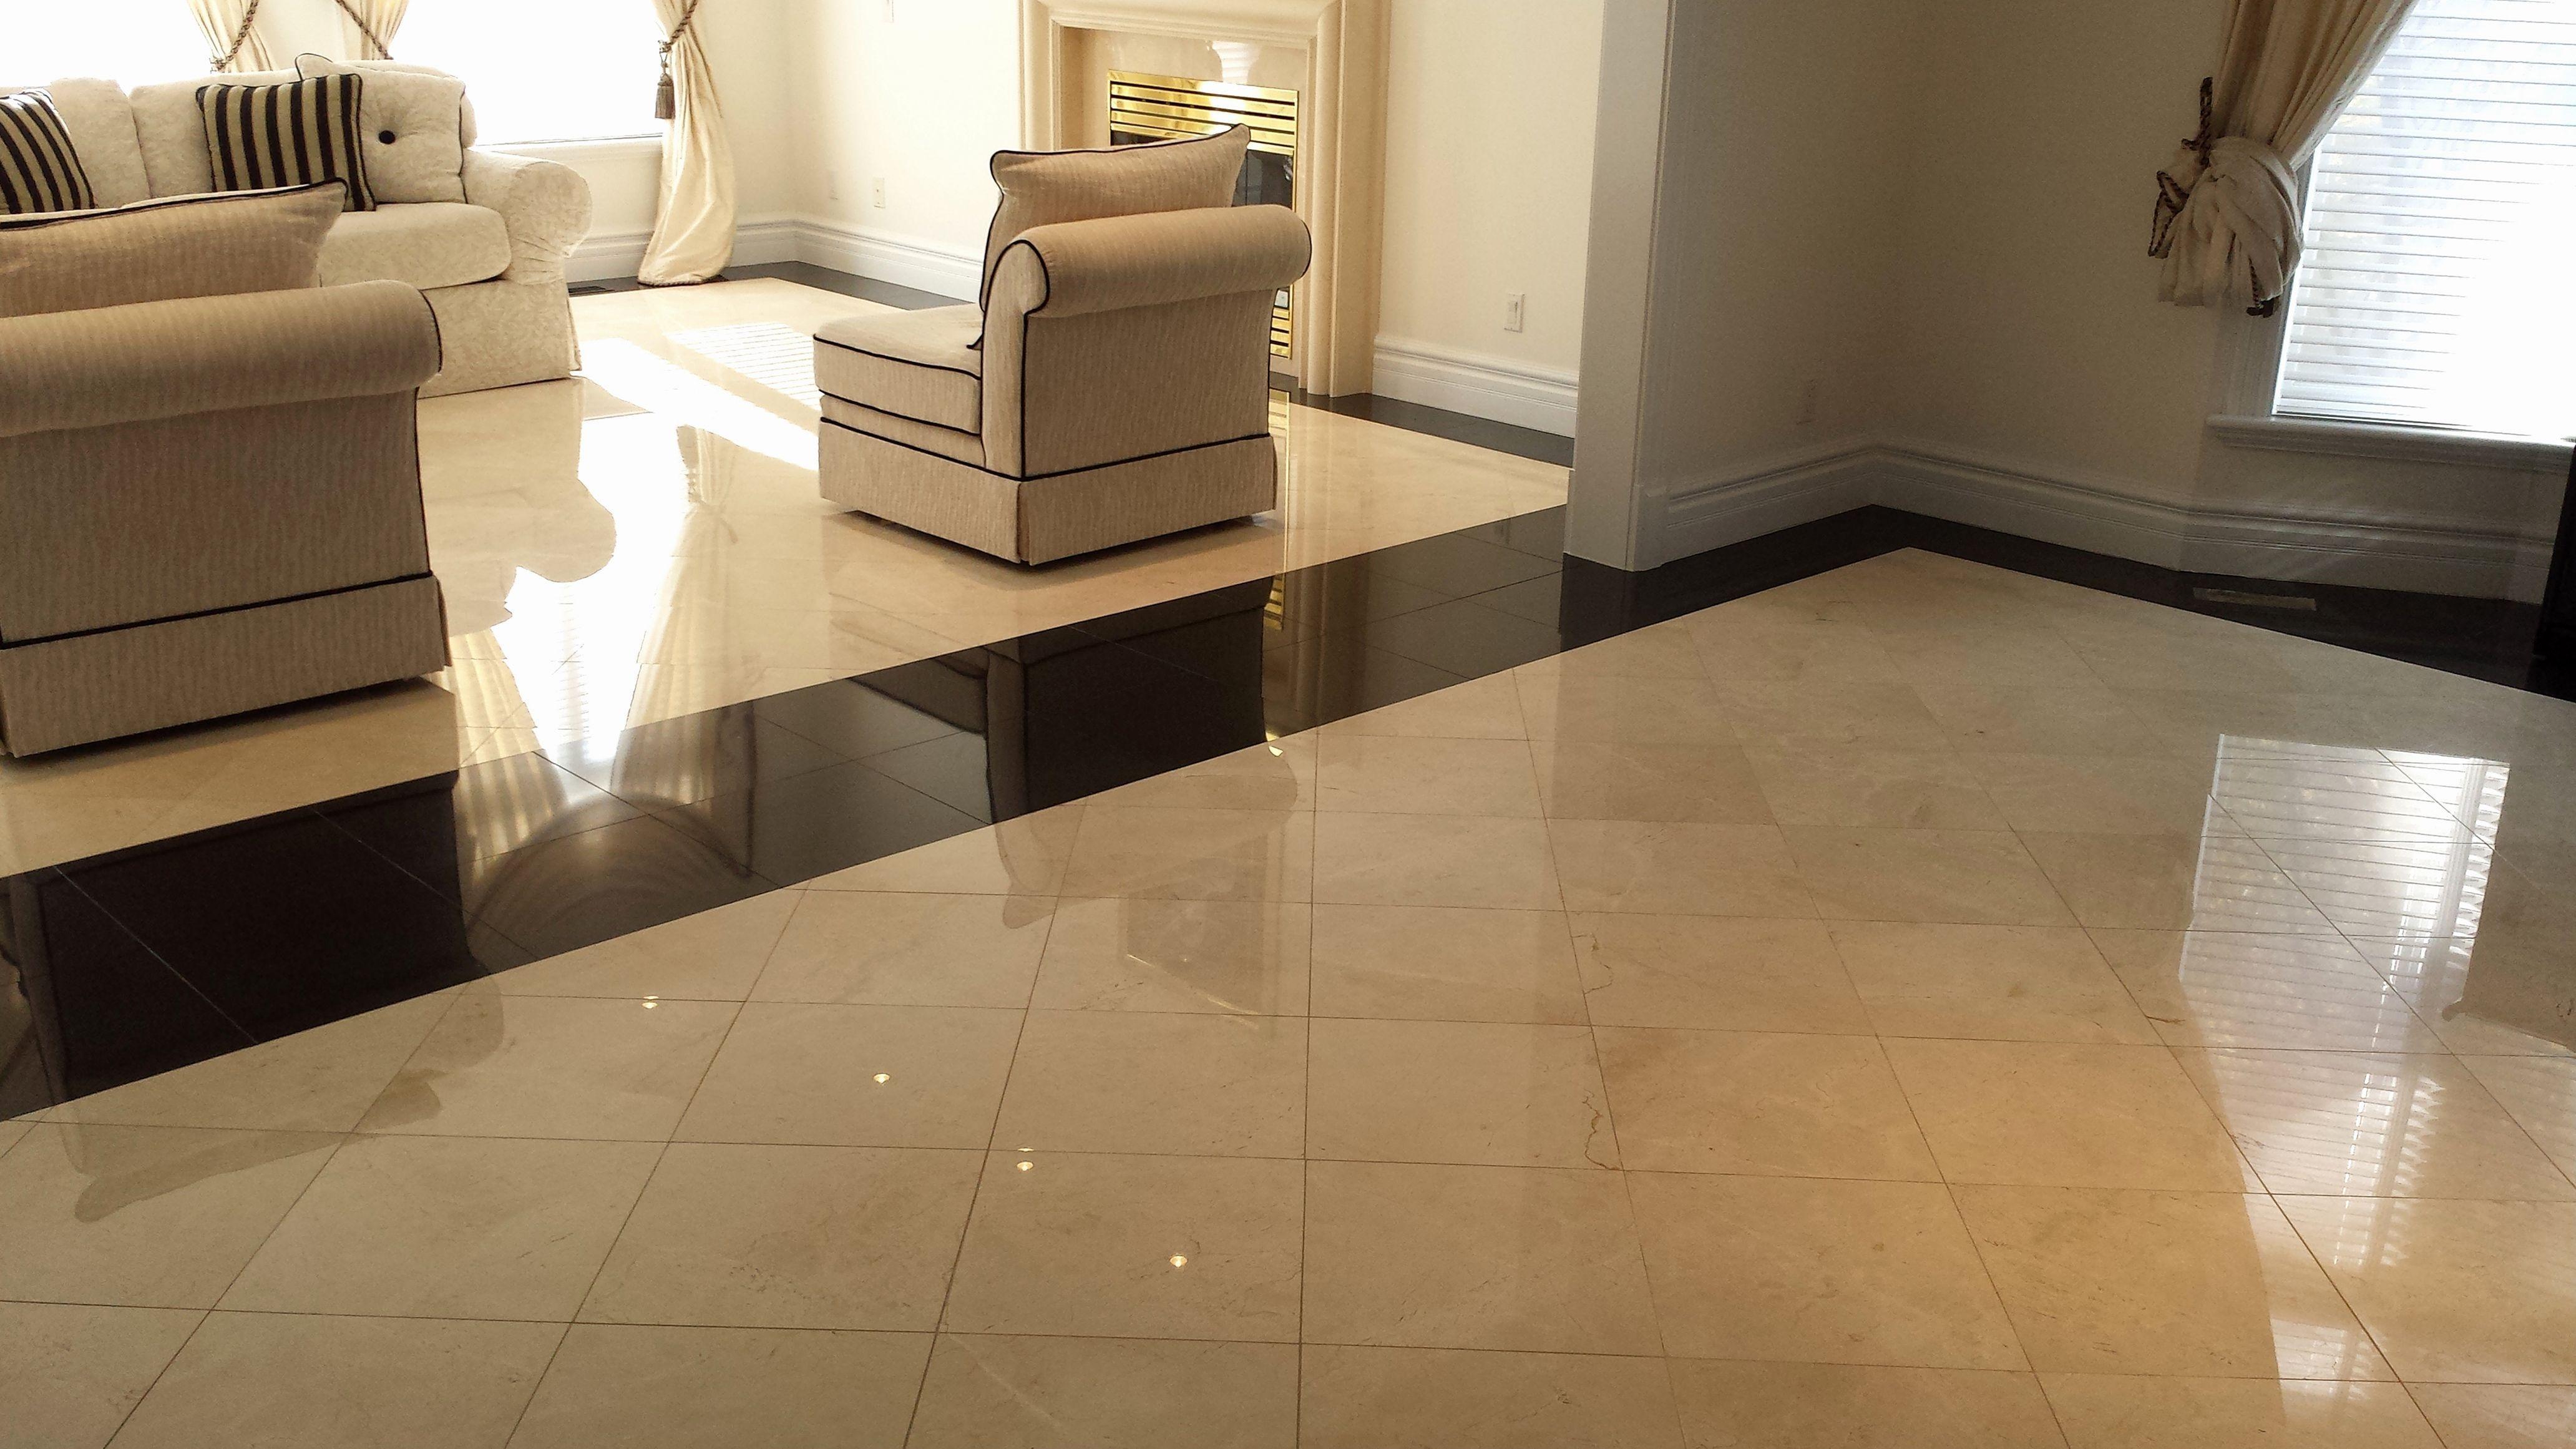 Extraordinary Living Room Design Ideas With Floor Granite 28